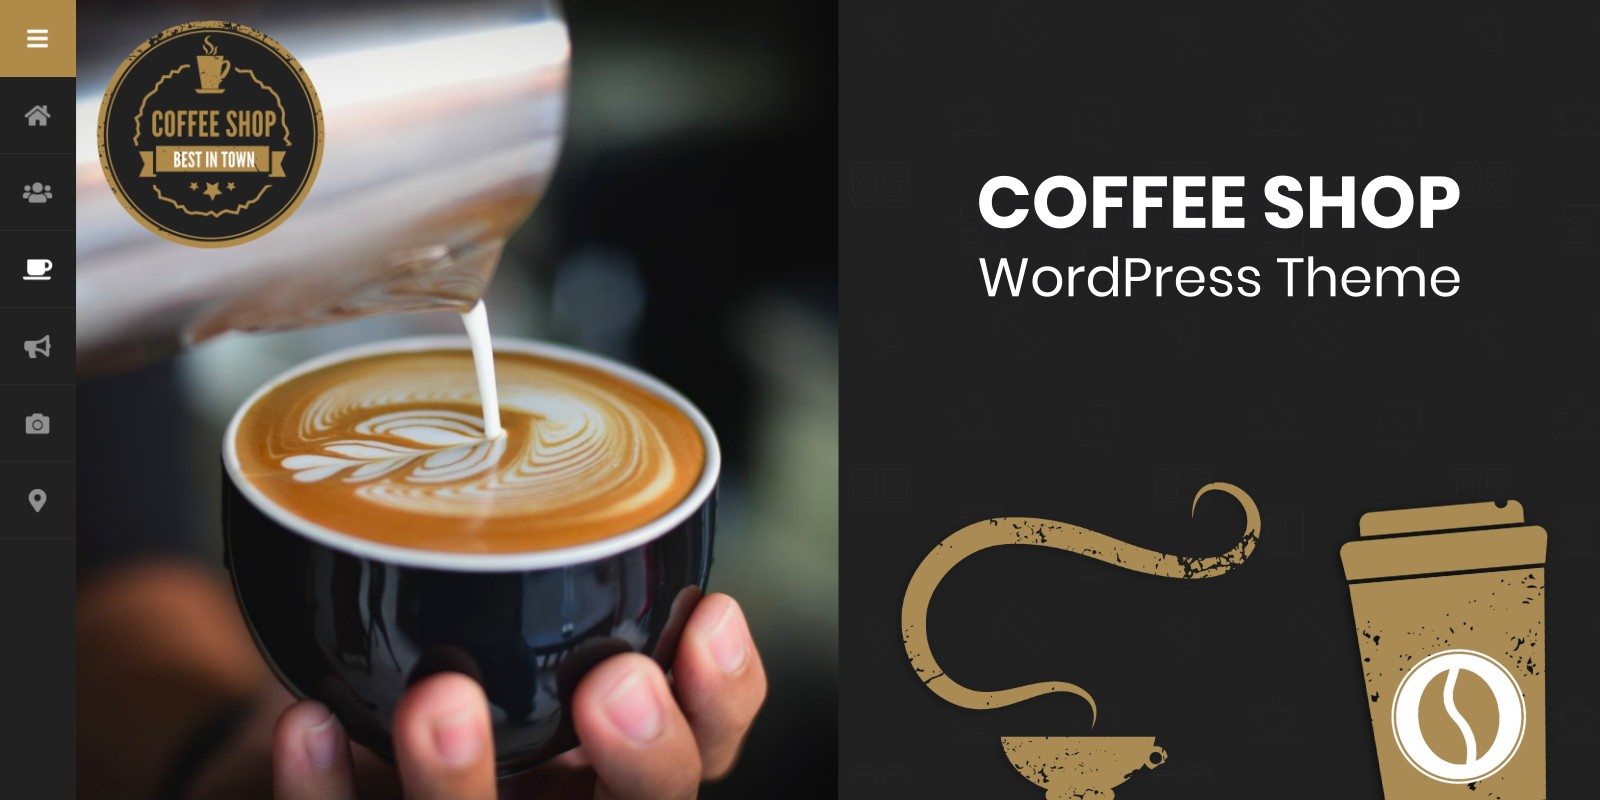 Coffee Shop - WordPress Theme